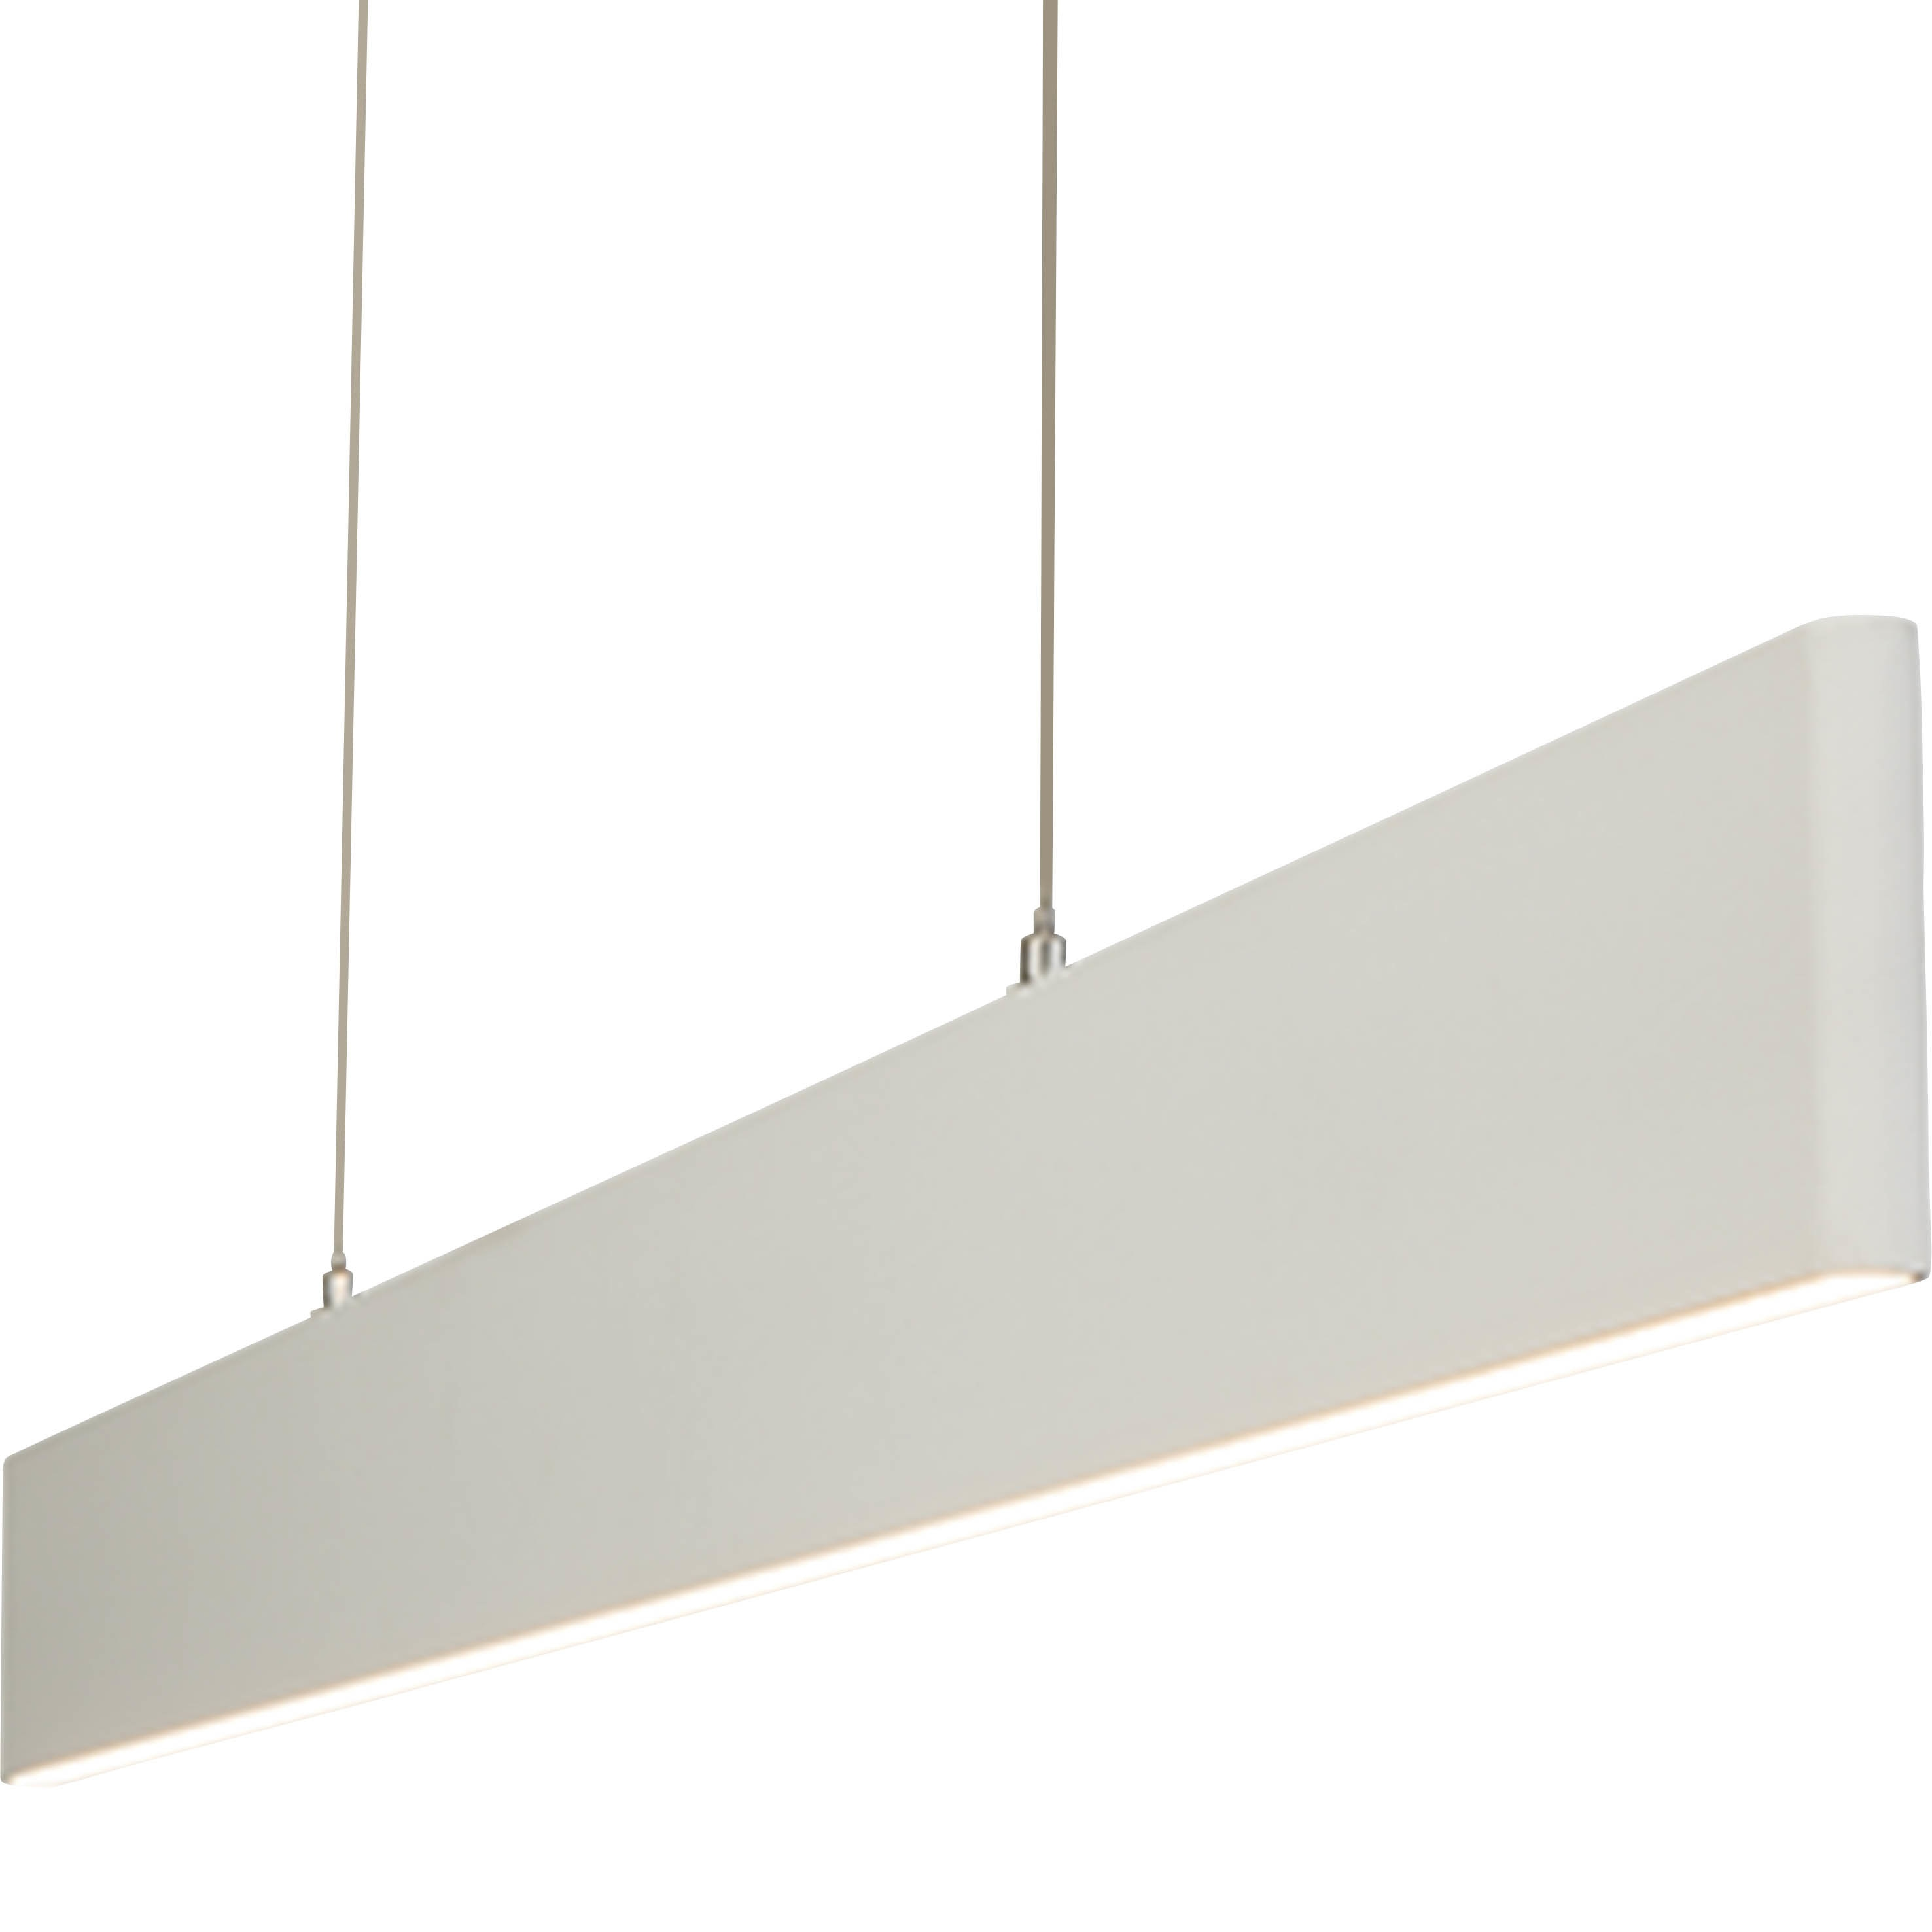 AEG Aura LED Pendelleuchte 1flg weiß